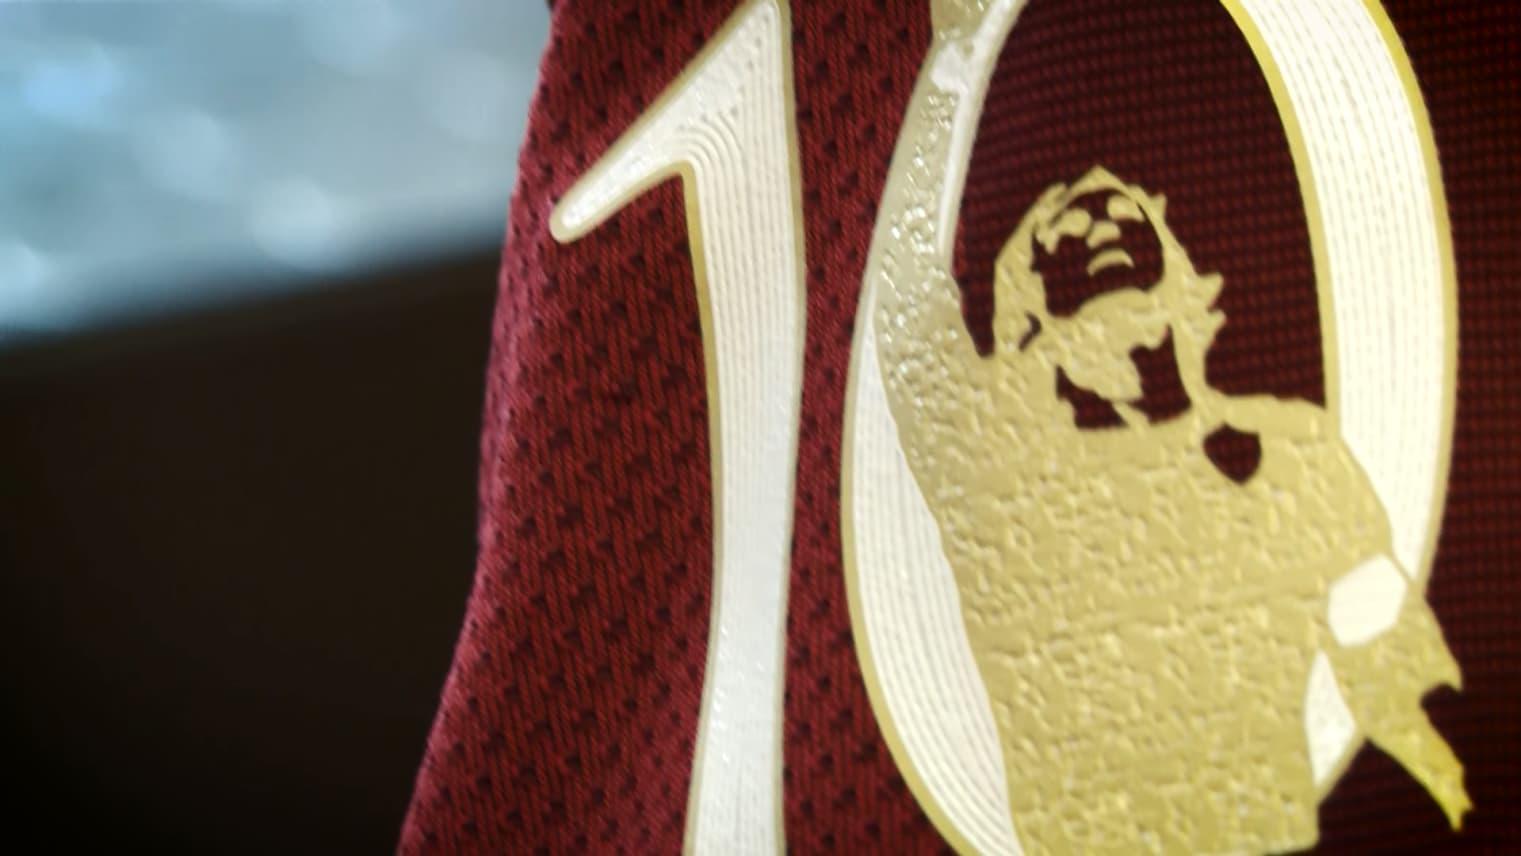 16caed0d13 Roma apresenta camisa especial para a despedida de Totti - Show de ...